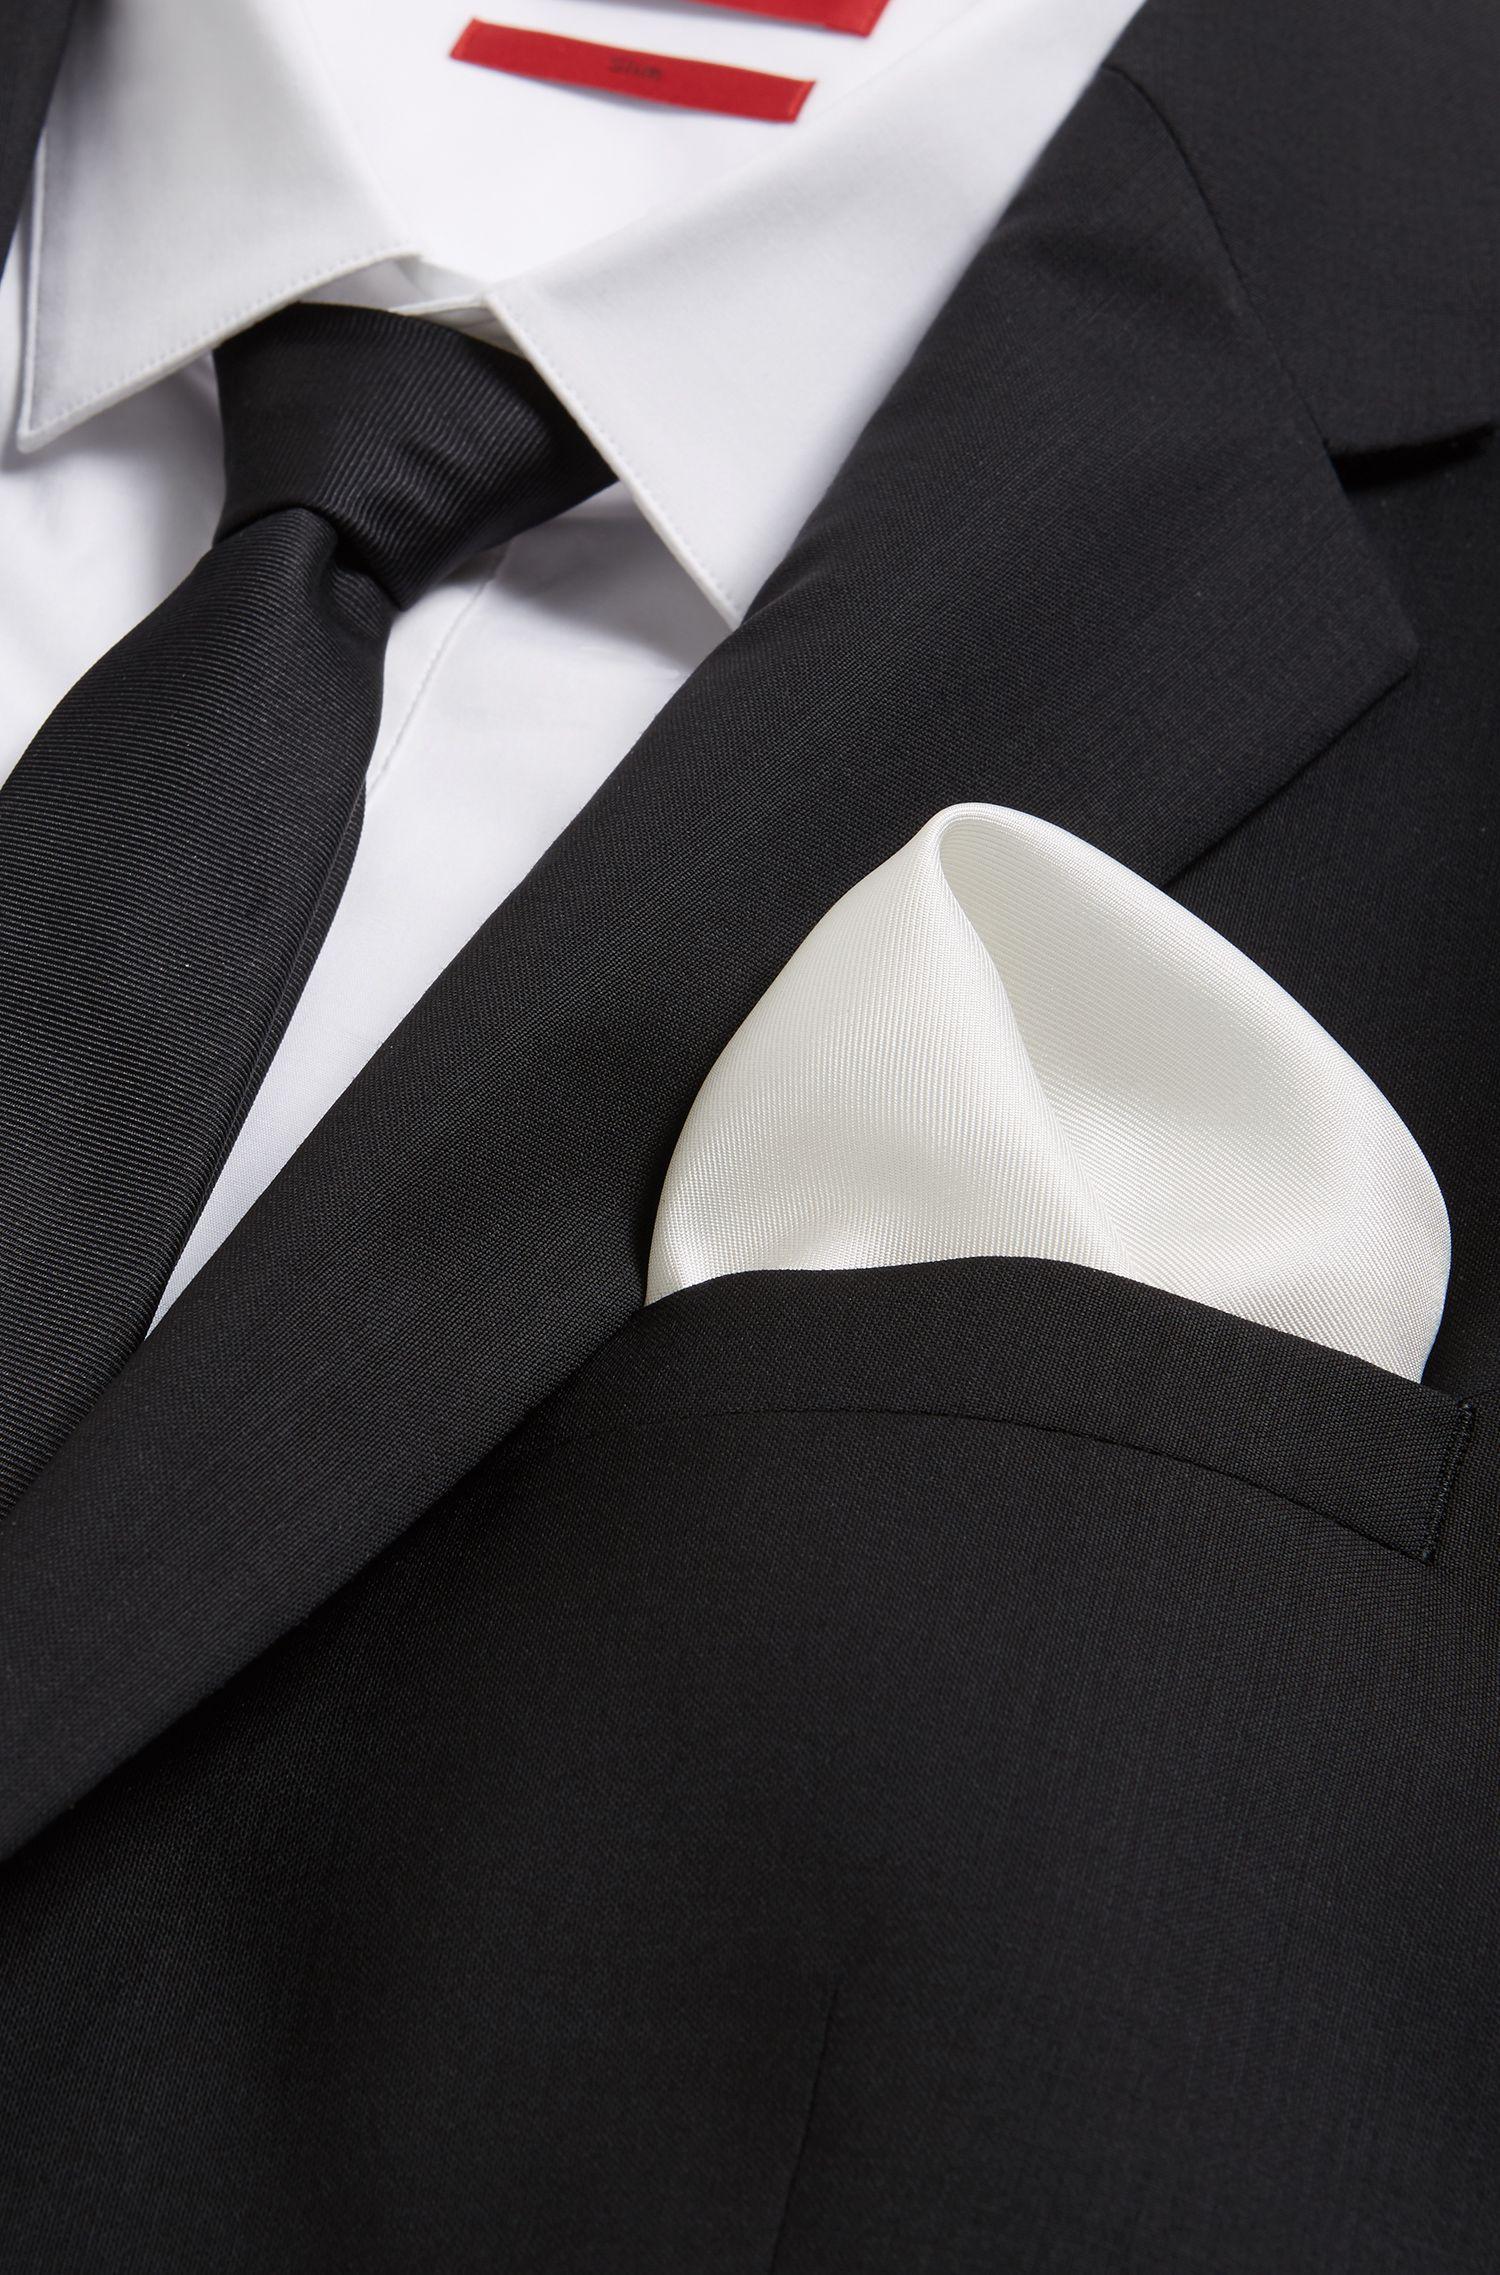 'Pocket sq. 33x33 cm' | Patterned Italian Silk Pocket Square, Open White